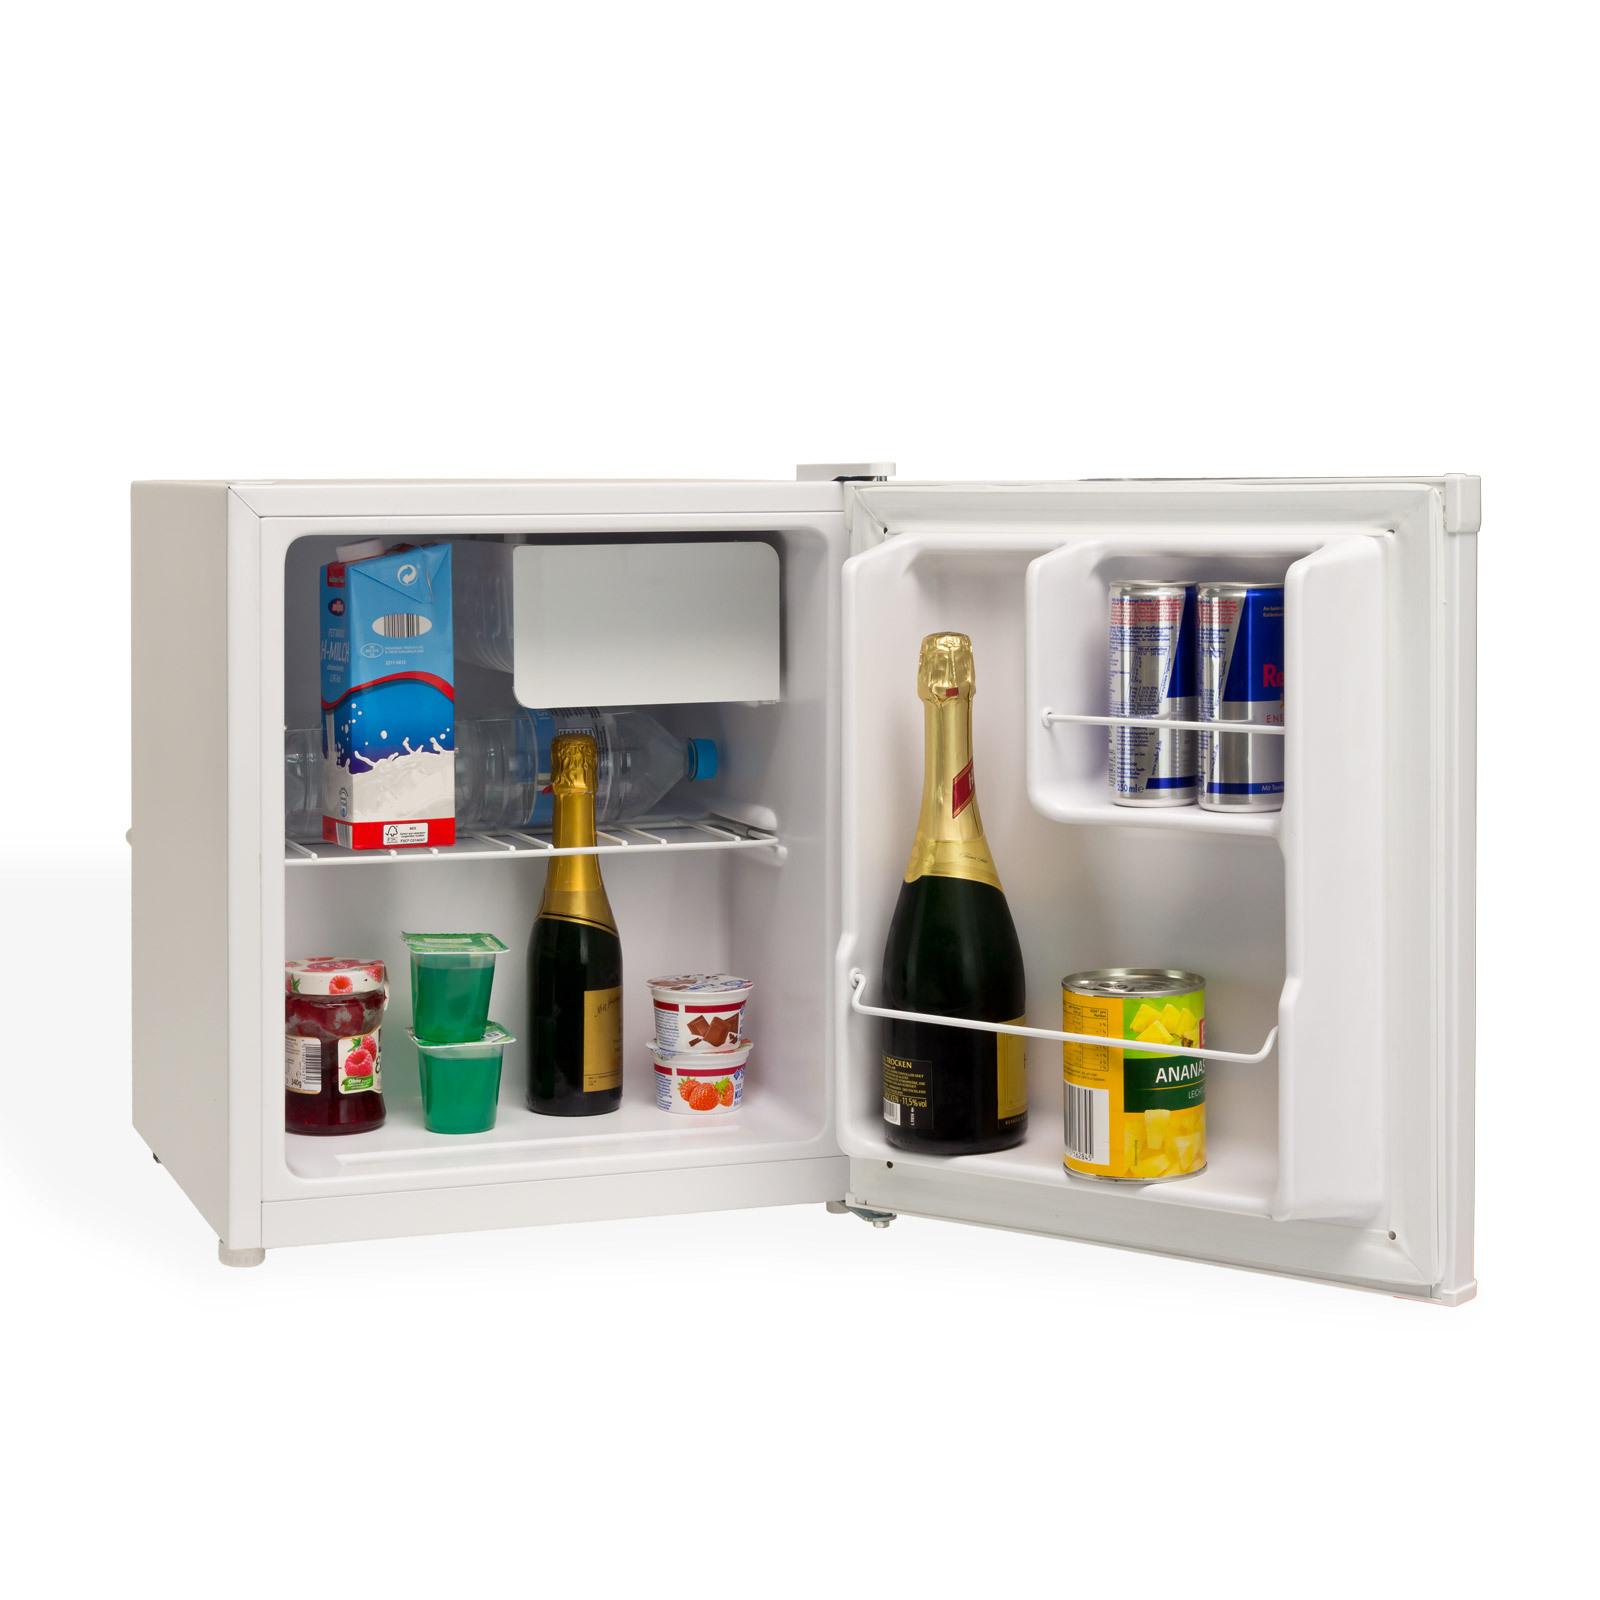 Mini kuhlschrank minikuhlschrank minibar tischkuhlschrank for Kühlschrank getr nkeschublade